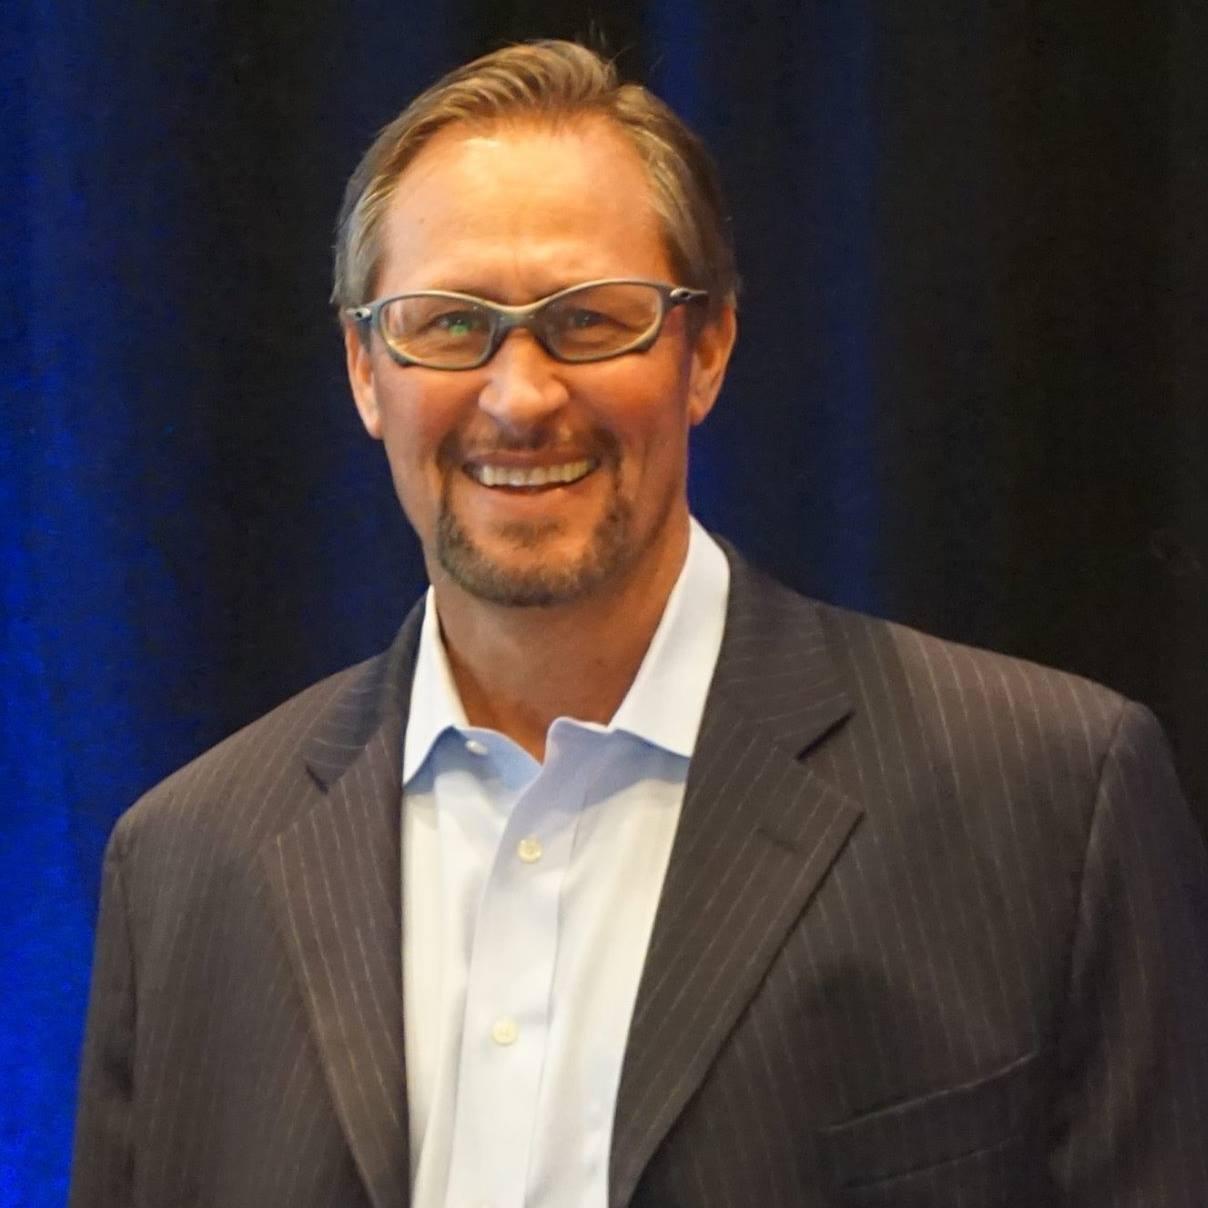 David Fabricous - Business Growth Expert